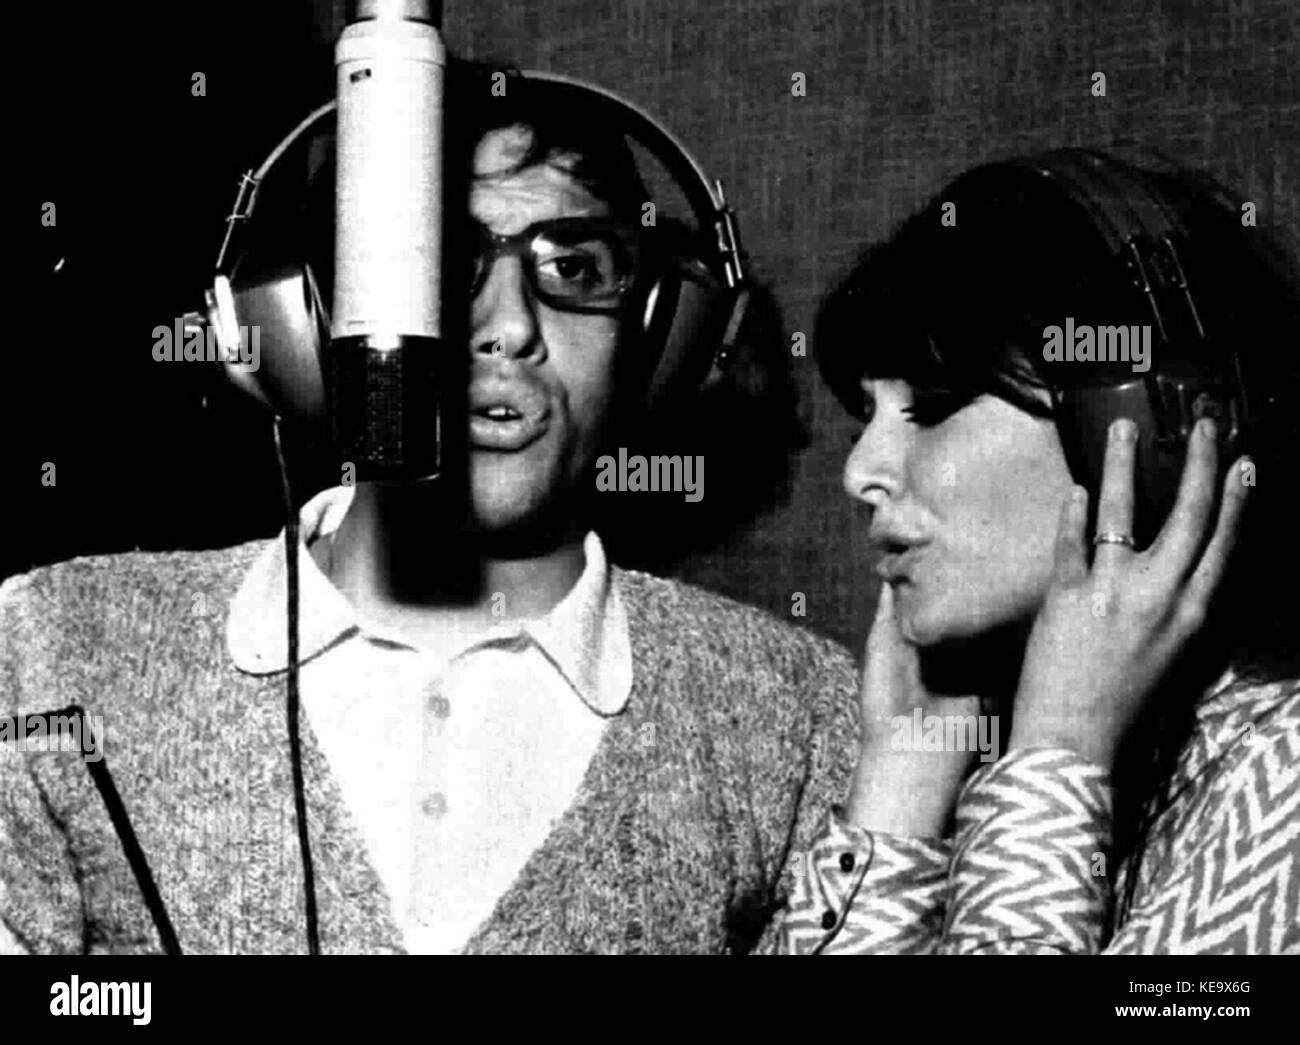 Adriano Celentano and Claudia Mori 1970 - Stock Image